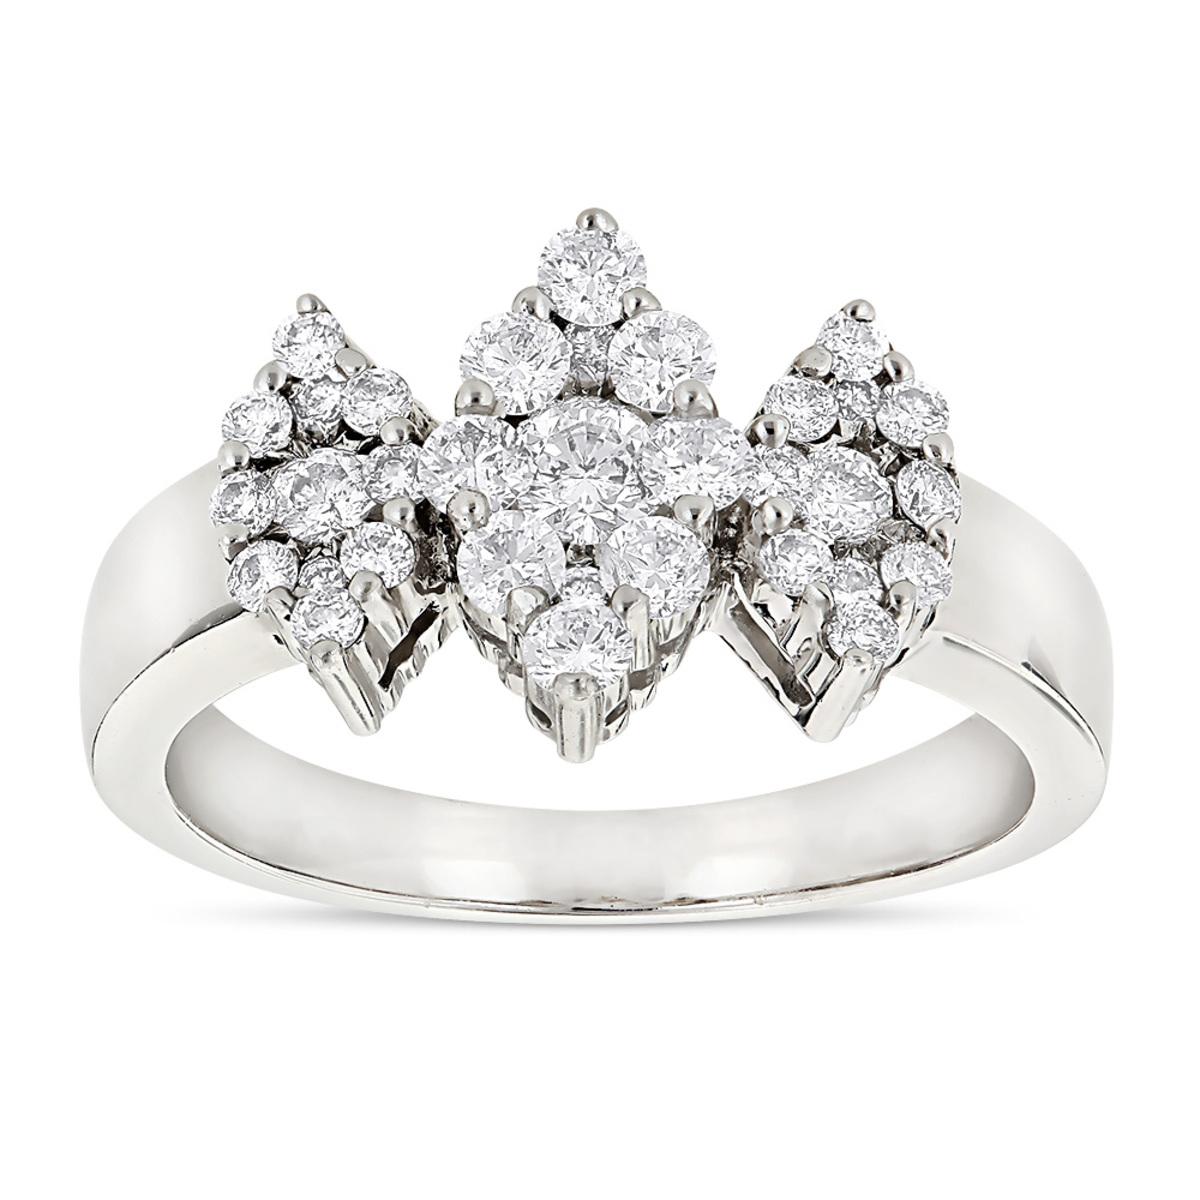 Ladies Cluster Diamond Ring 1.2ct Three Stone Marquise Diamonds Look